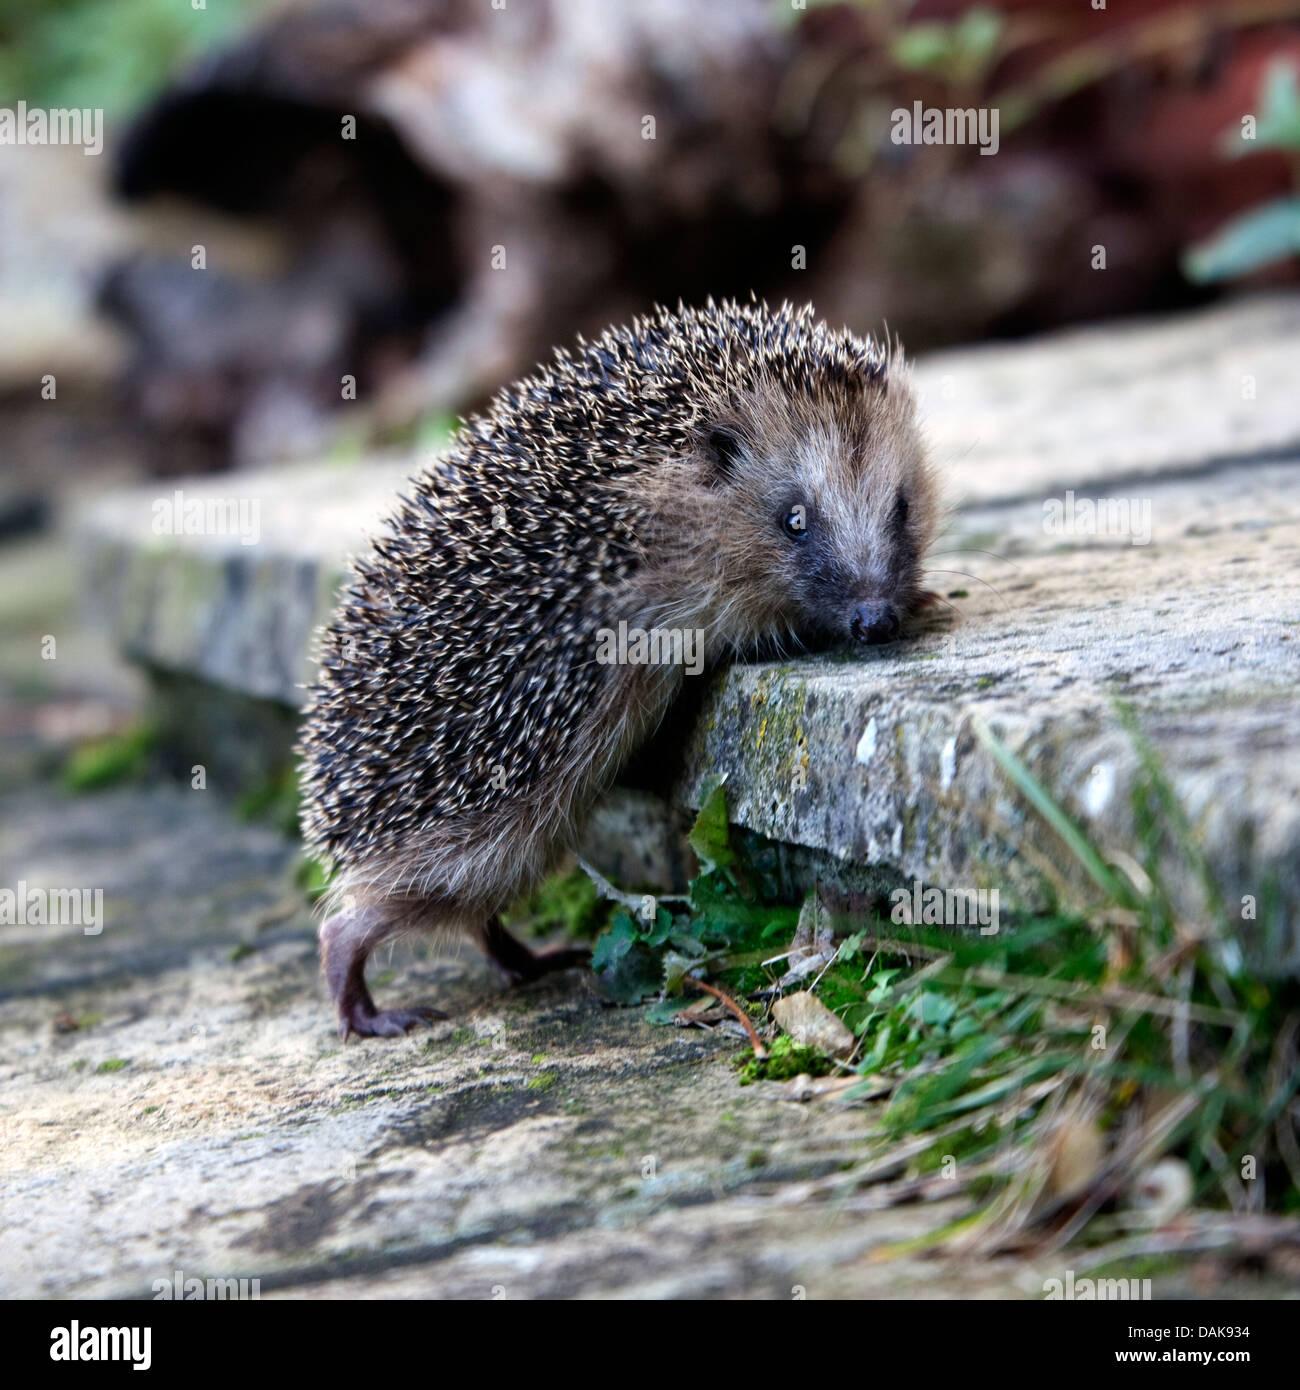 European hedgehog climbing garden steps - Stock Image